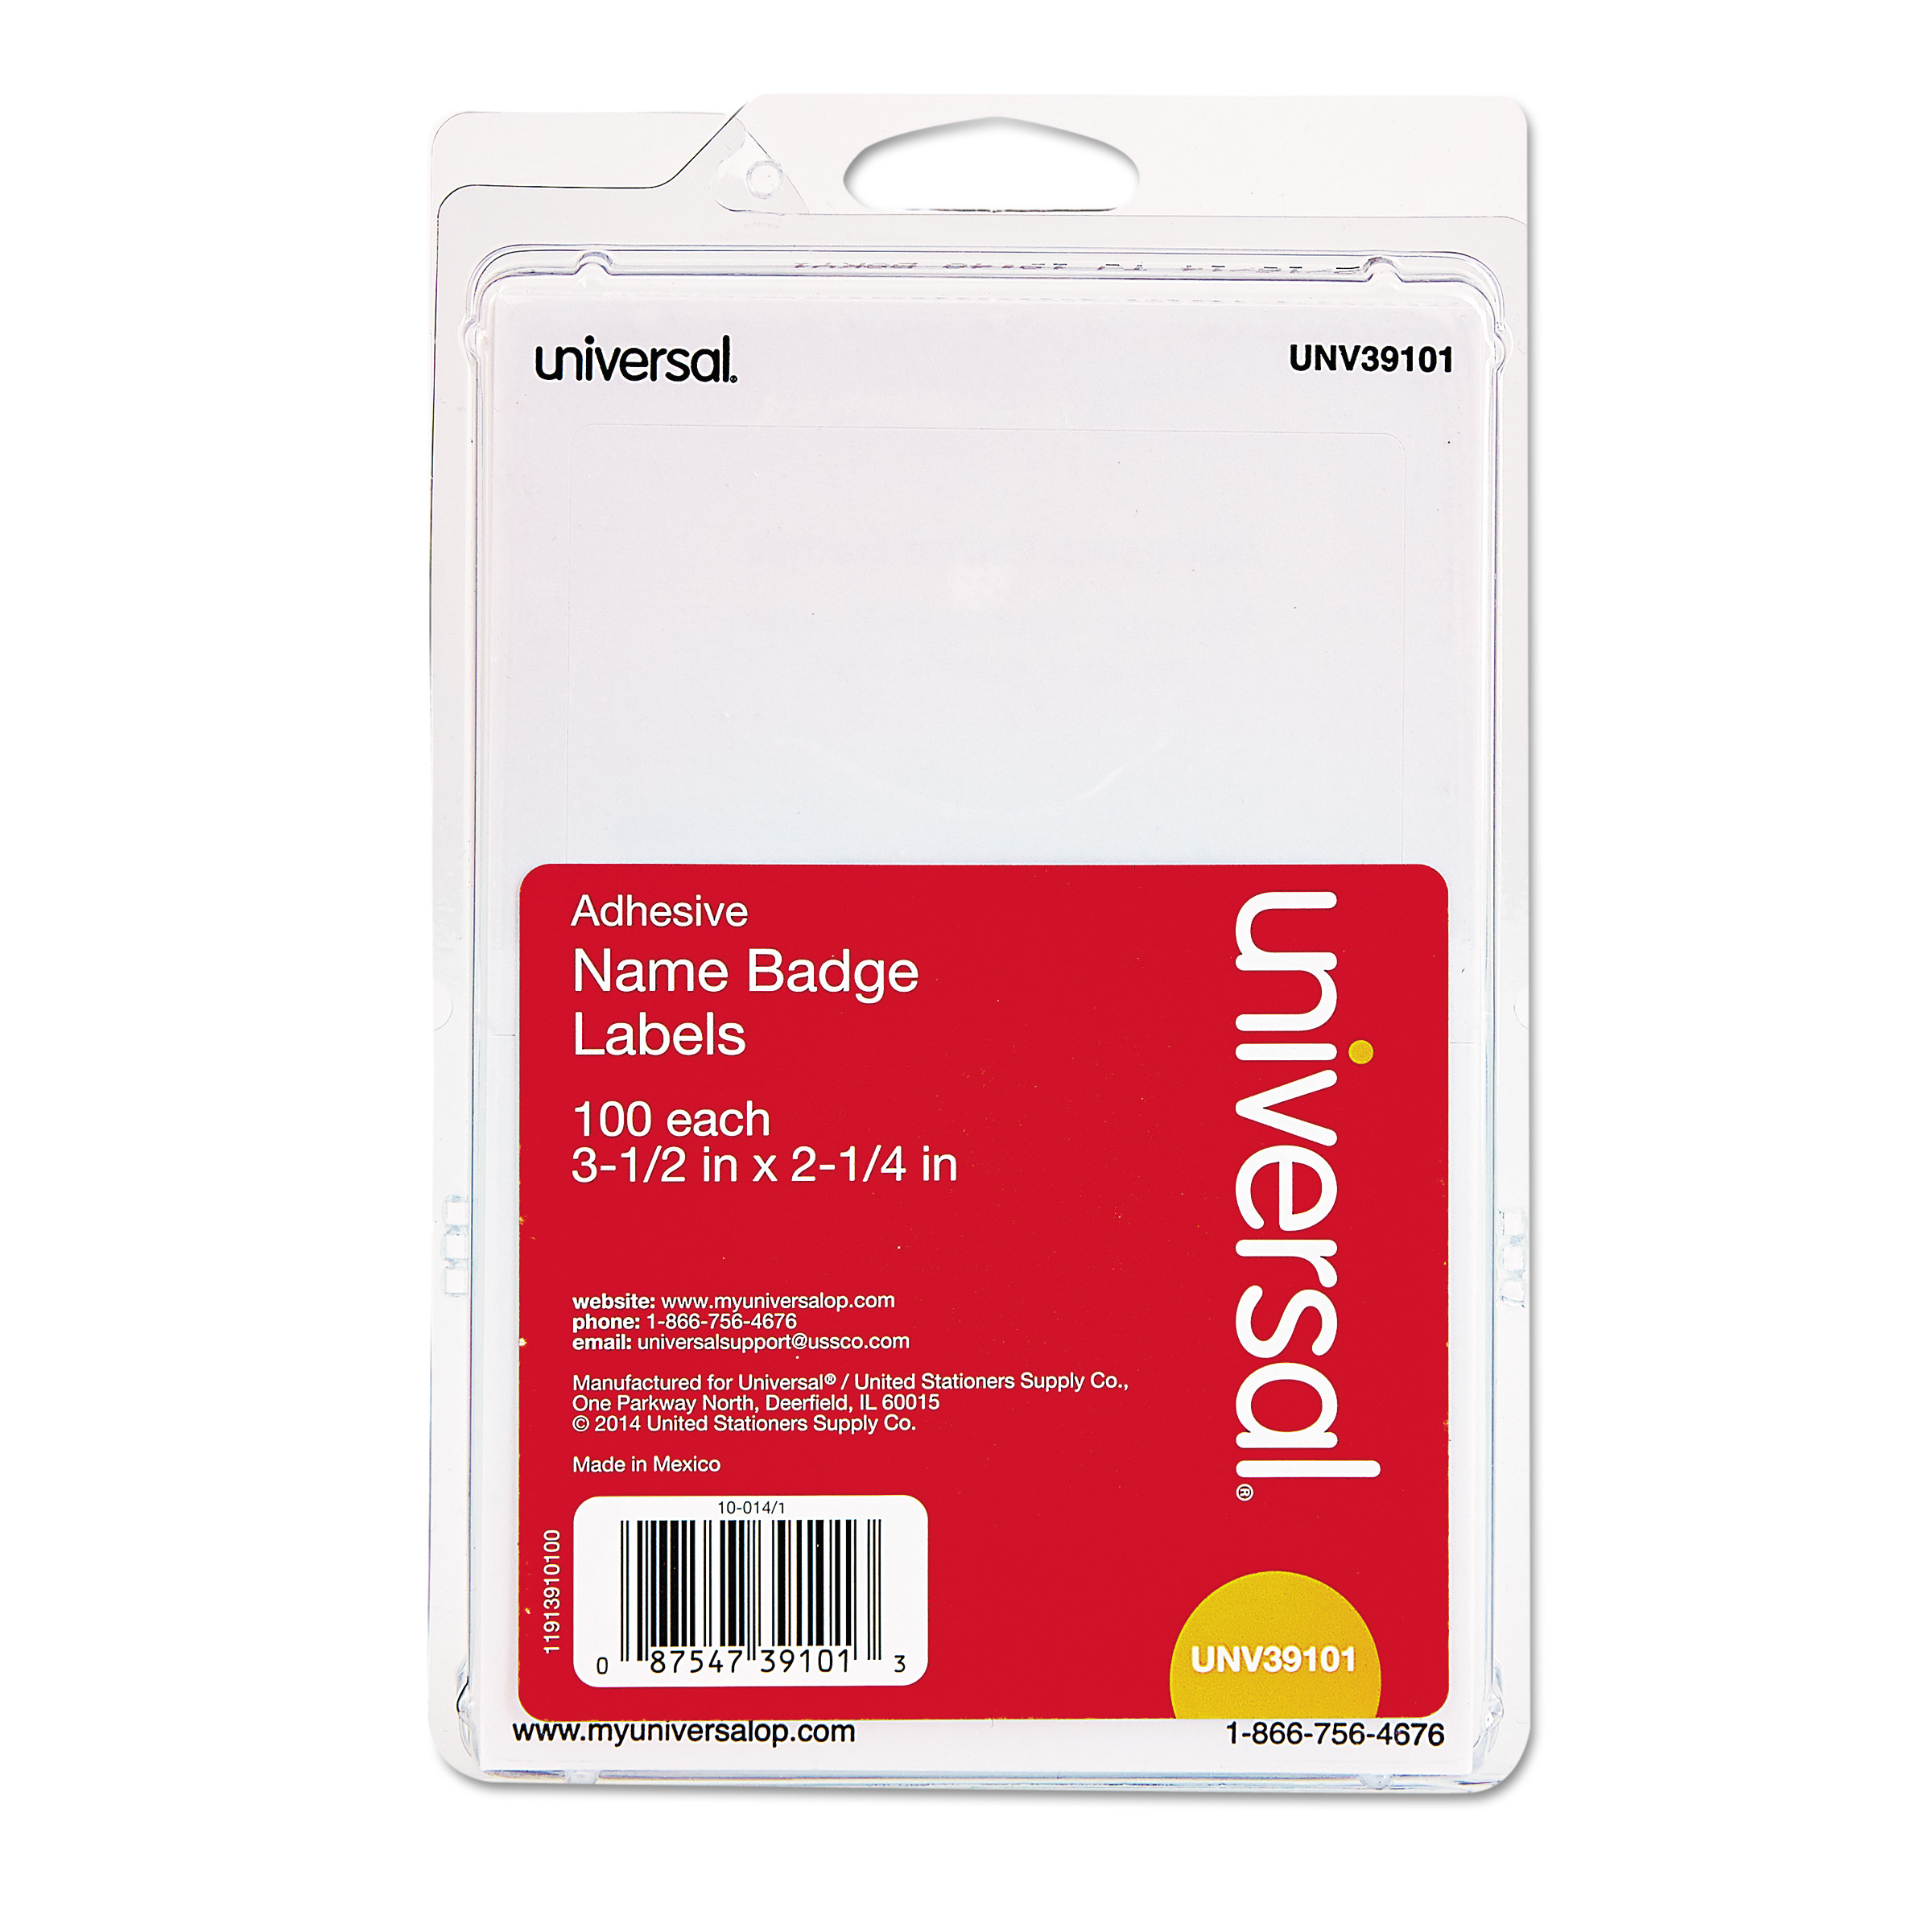 Universal Plain Self-Adhesive Name Badges, 3 1/2 x 2 1/4, White, 100/Pack -UNV39101